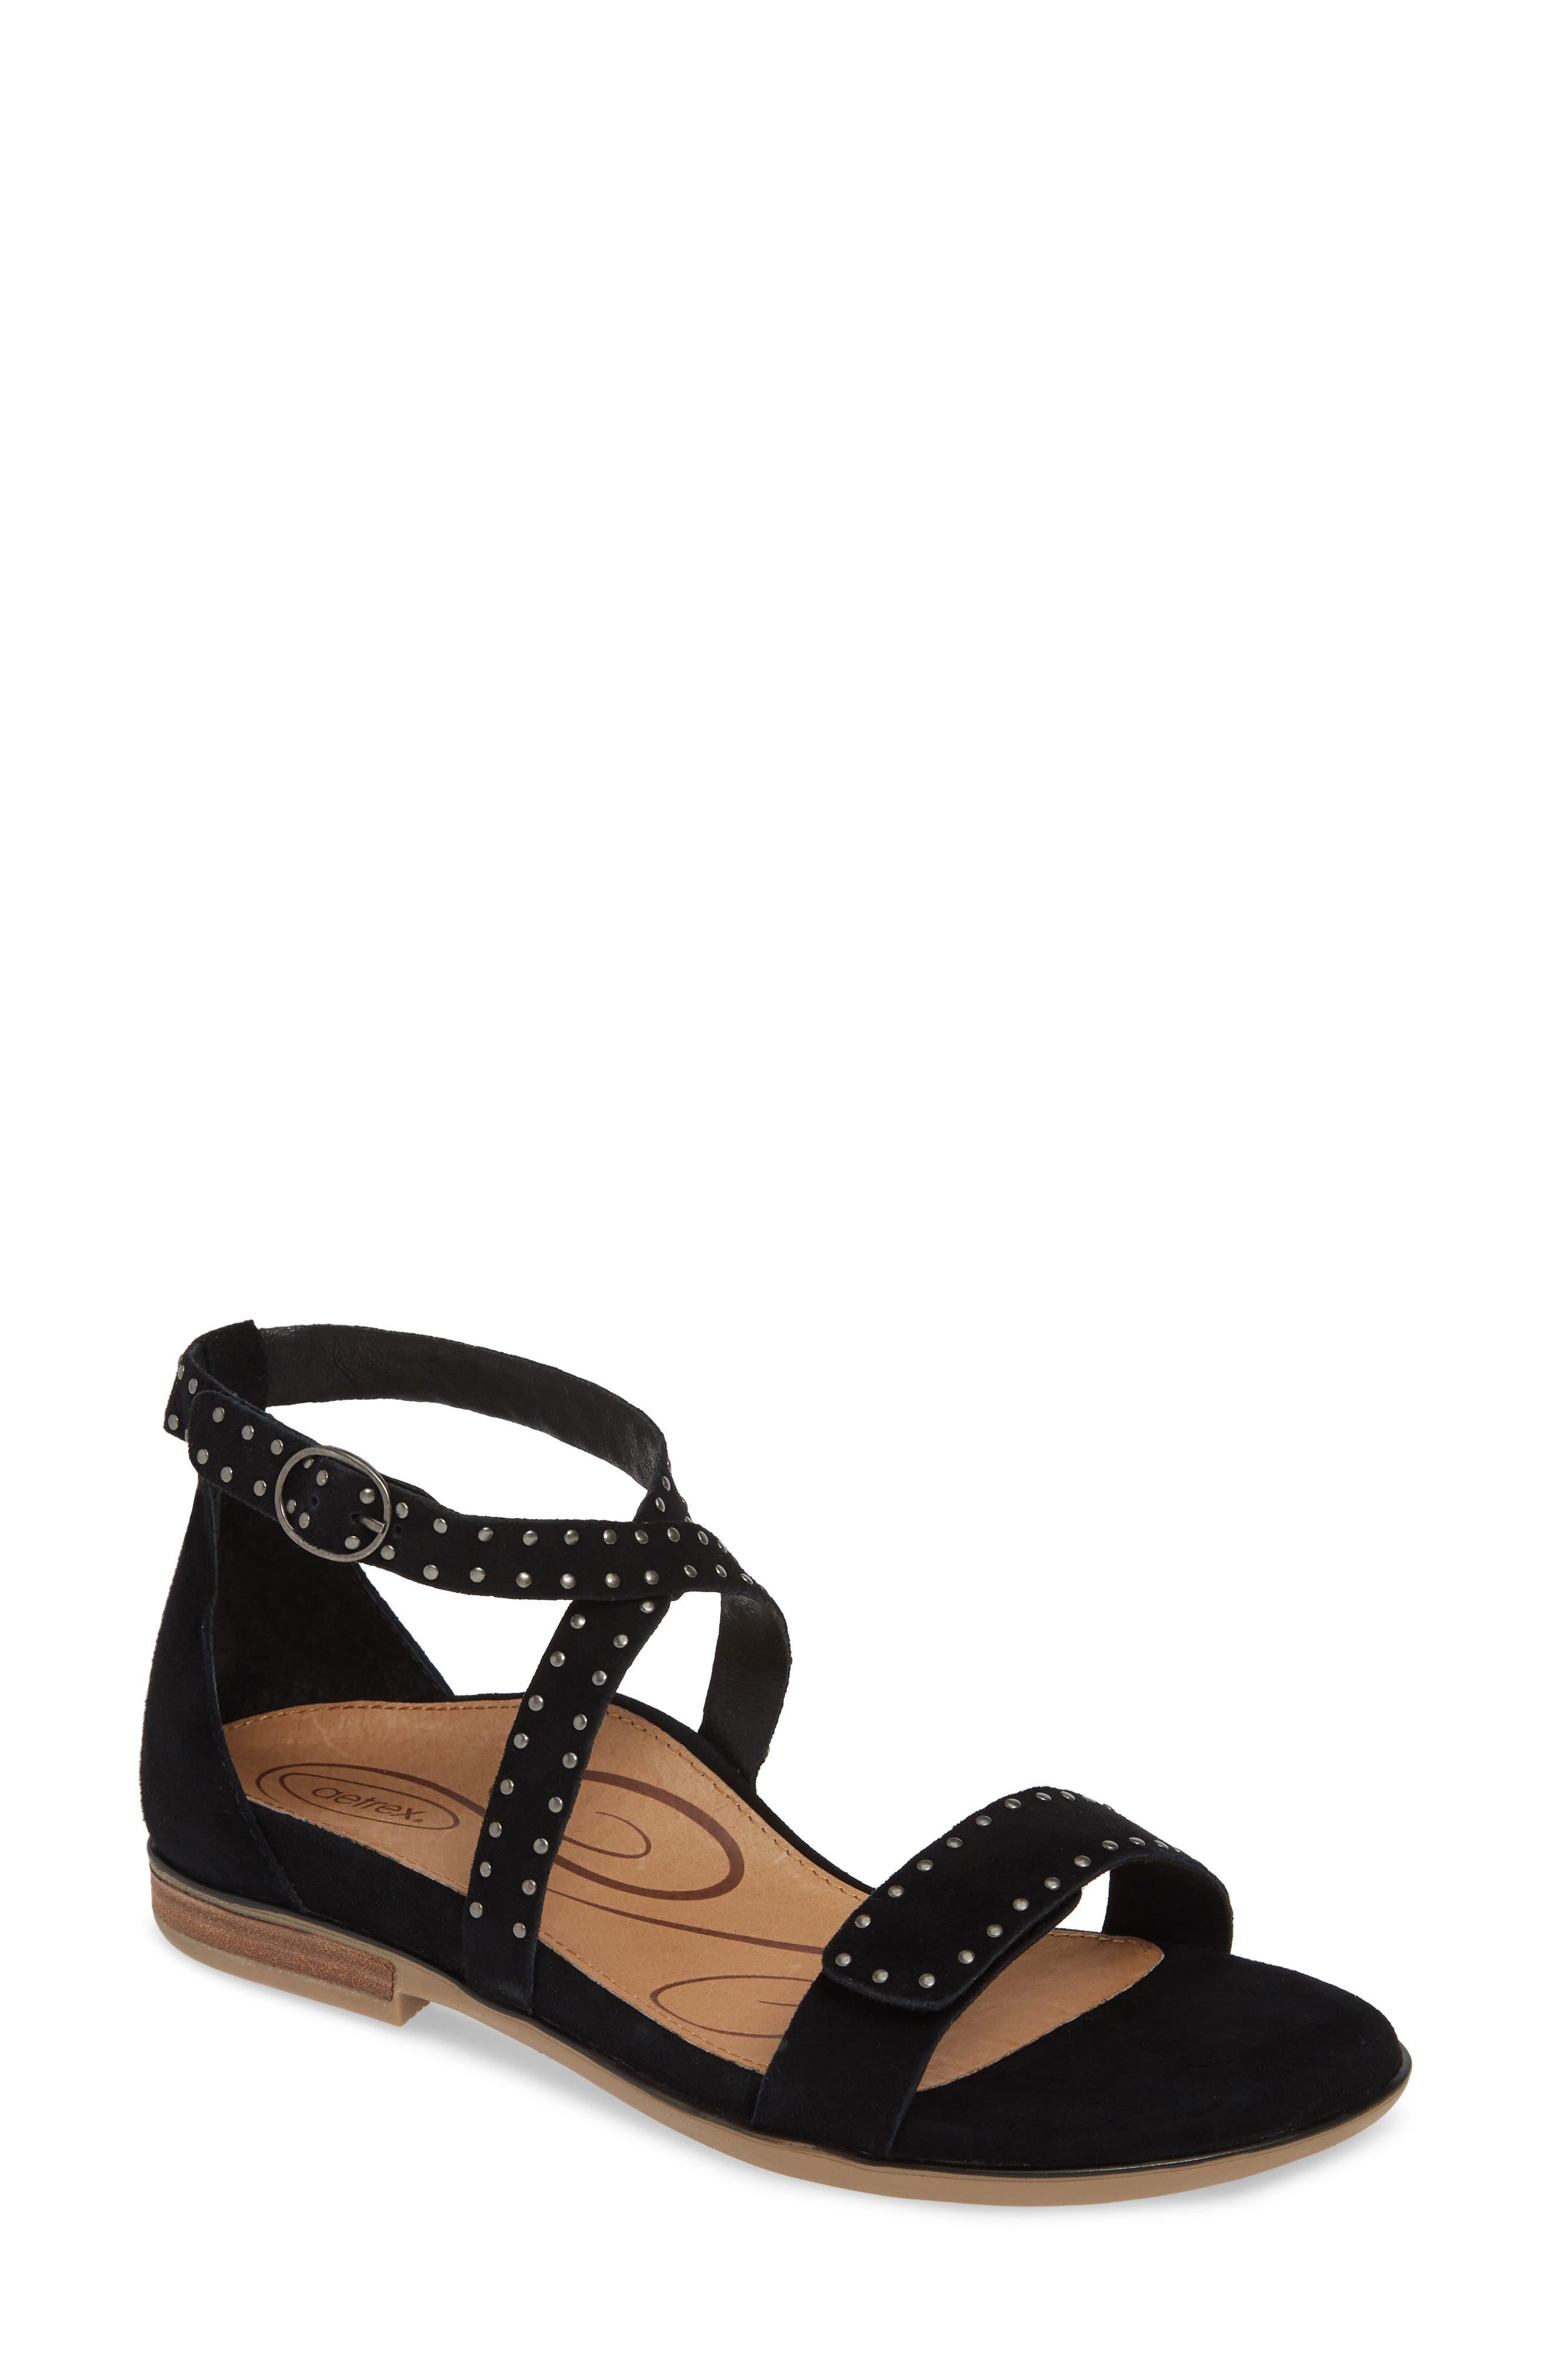 AETREX, Hailey Studded Sandal, Main thumbnail 1, color, BLACK SUEDE